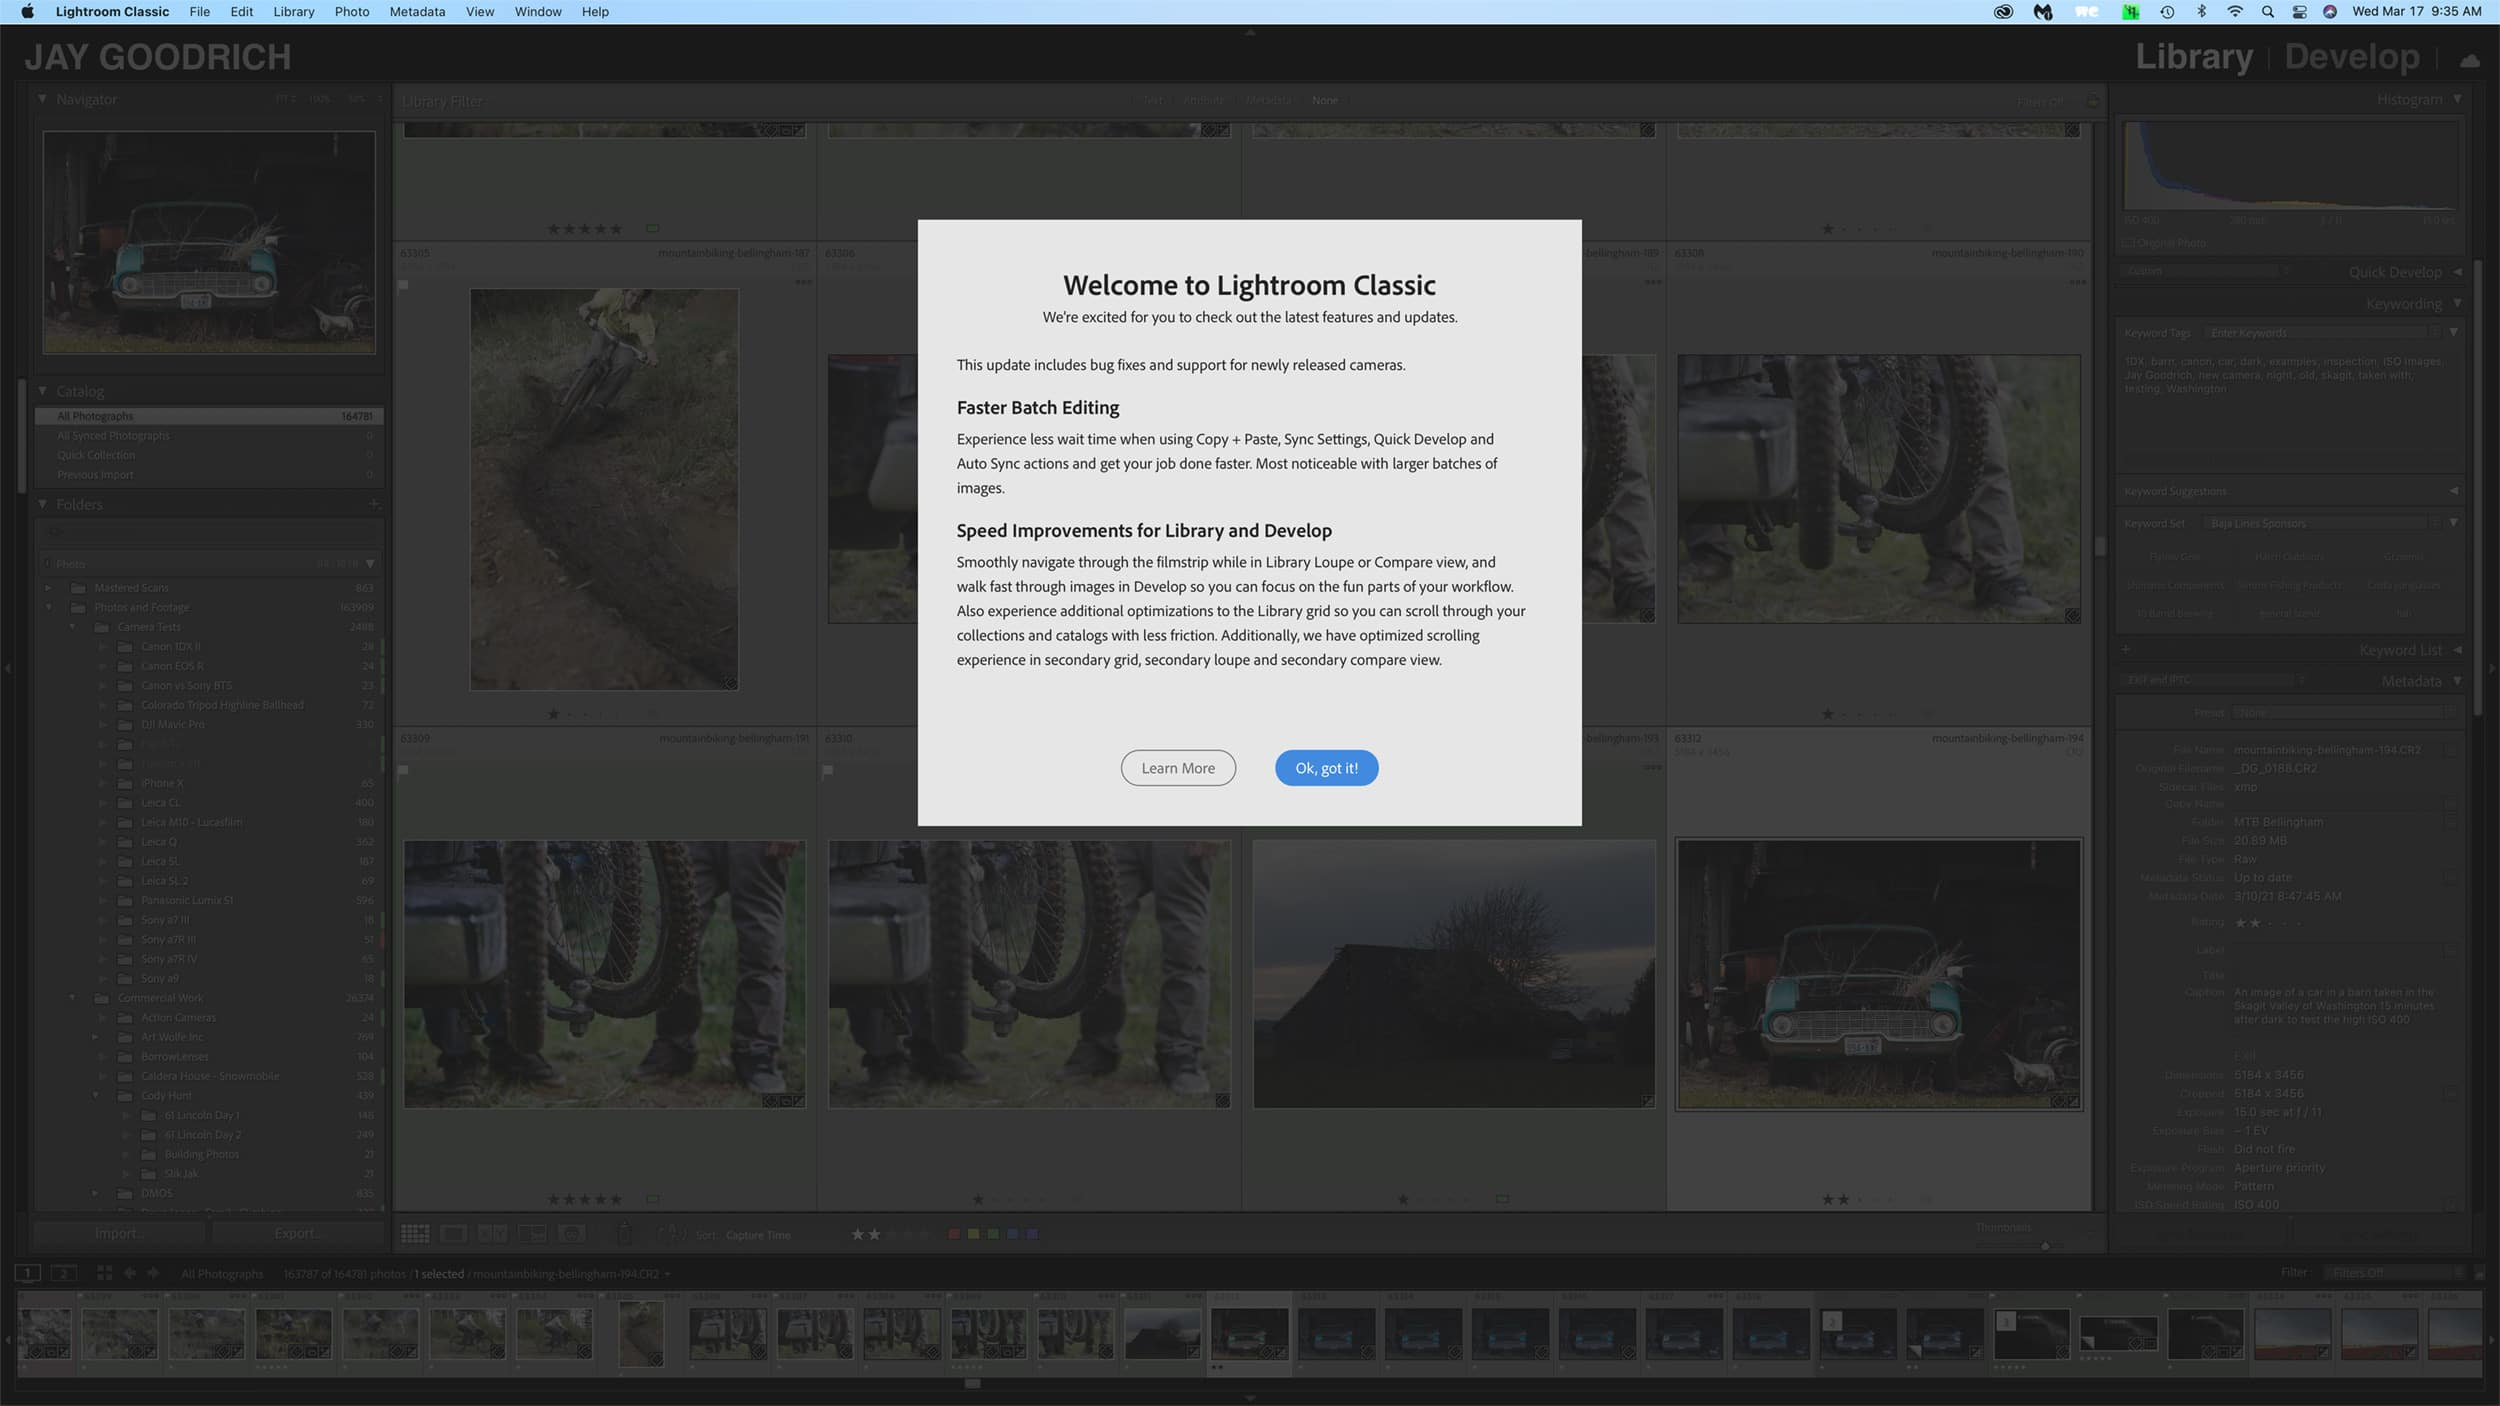 Adobe Lightroom Classic Update Screenshot by Jay Goodrich